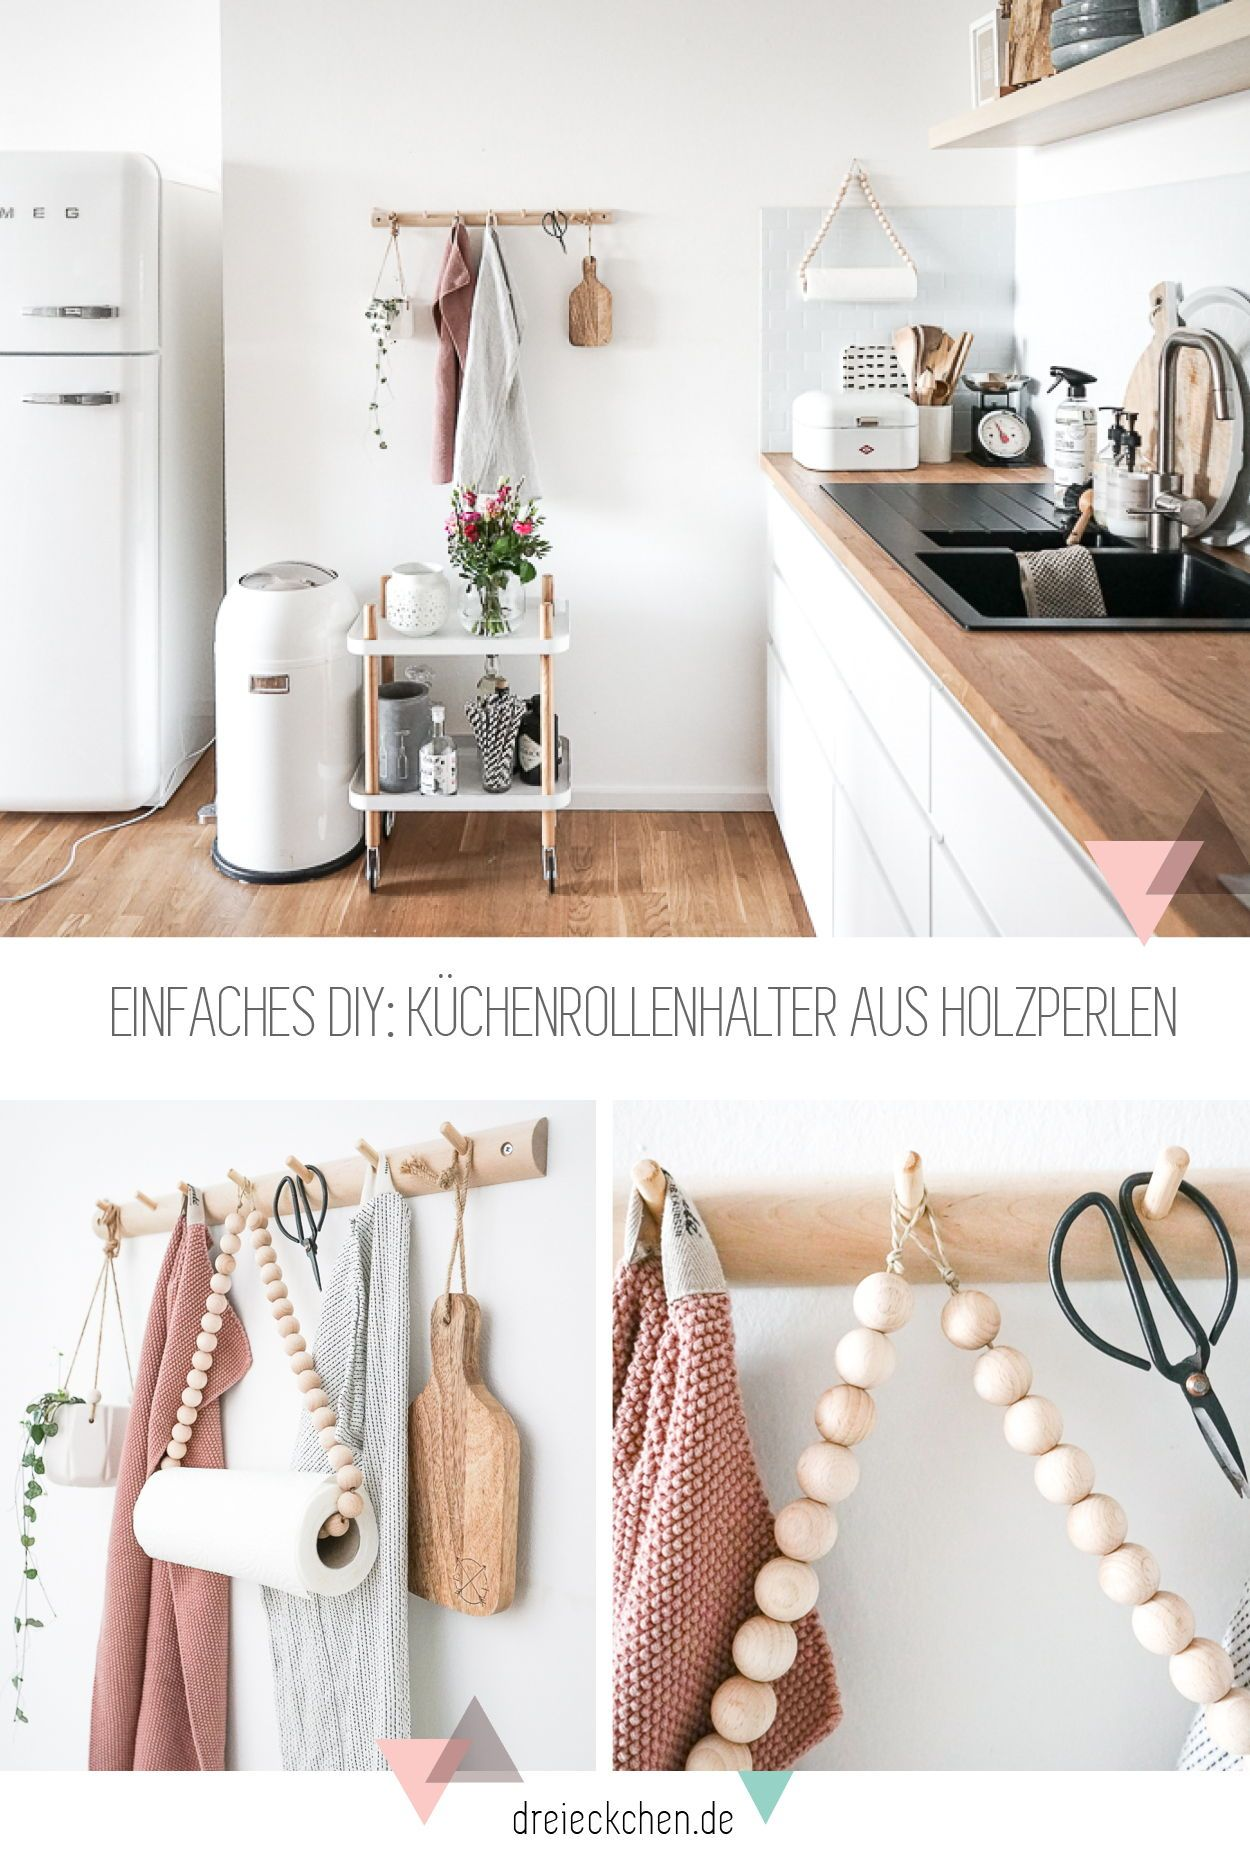 Photo of Practical kitchen gadgets – DIY ideas for kitchen roll holders, coasters and towel racks #dreimalanders ›dreieckchen – Lifestyle Blog #dreimalanders